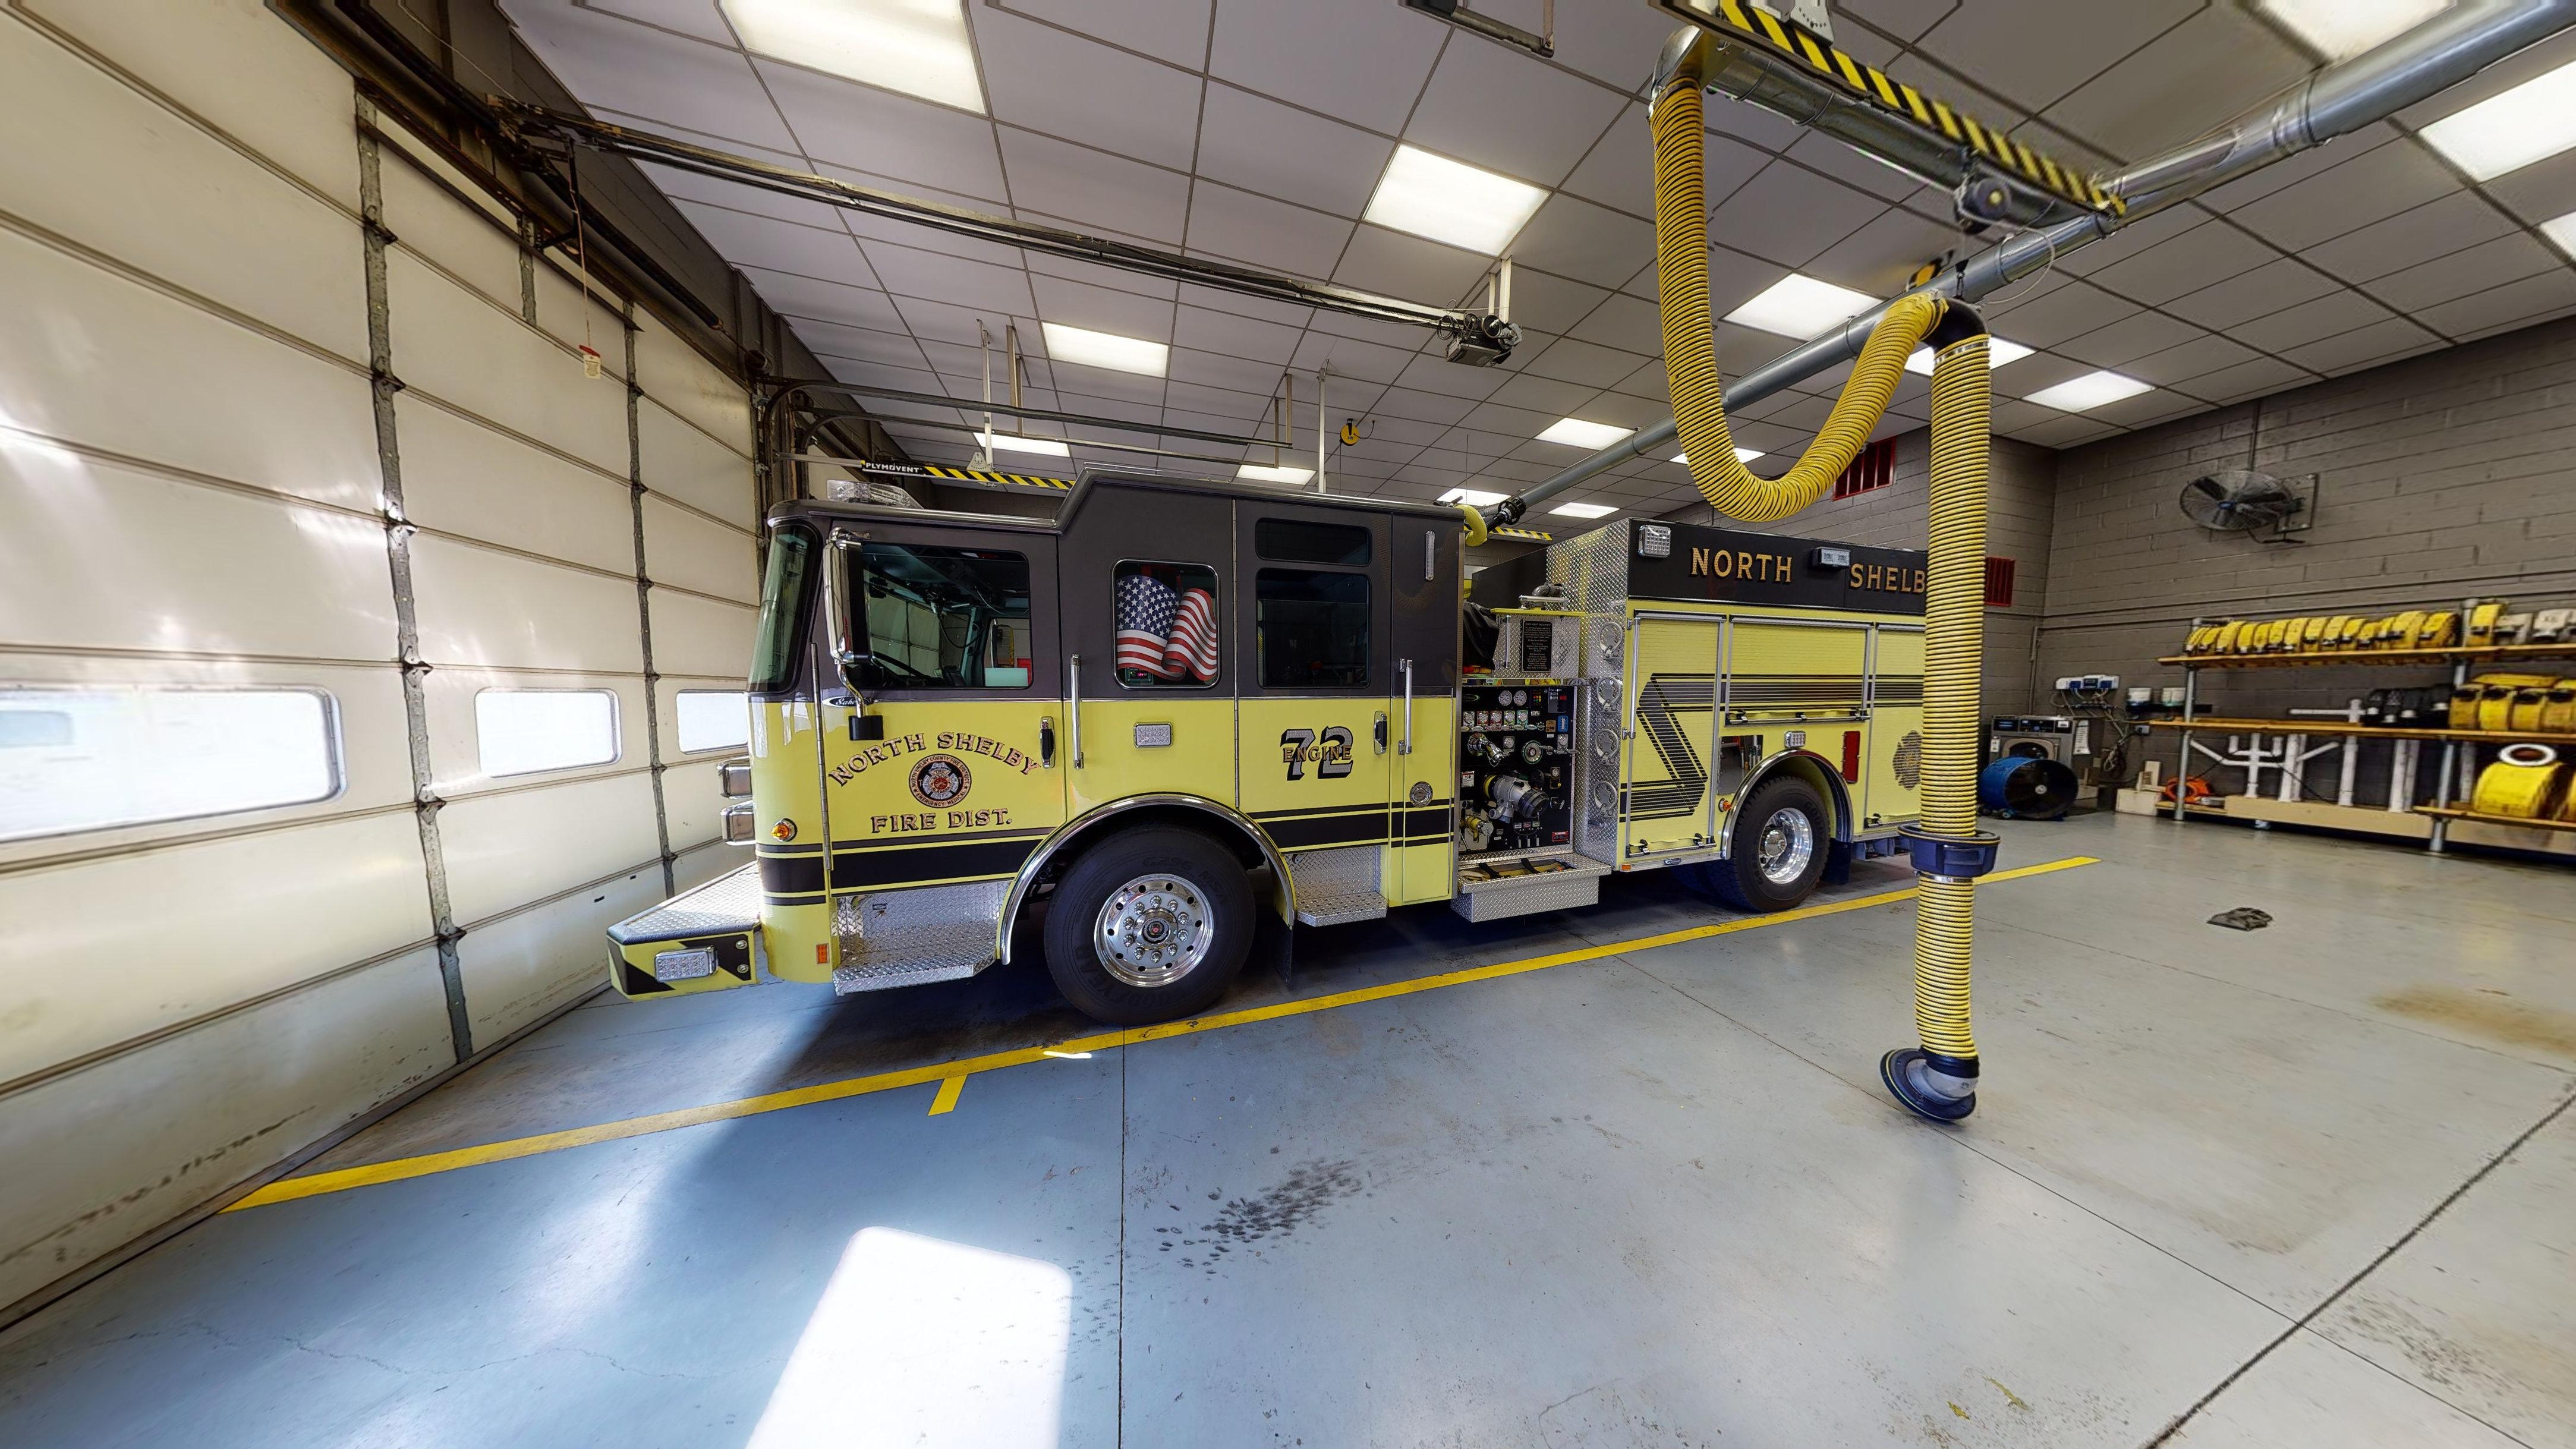 North-Shelby-Fire-District-Saber-custom-pumper-12092020_171630